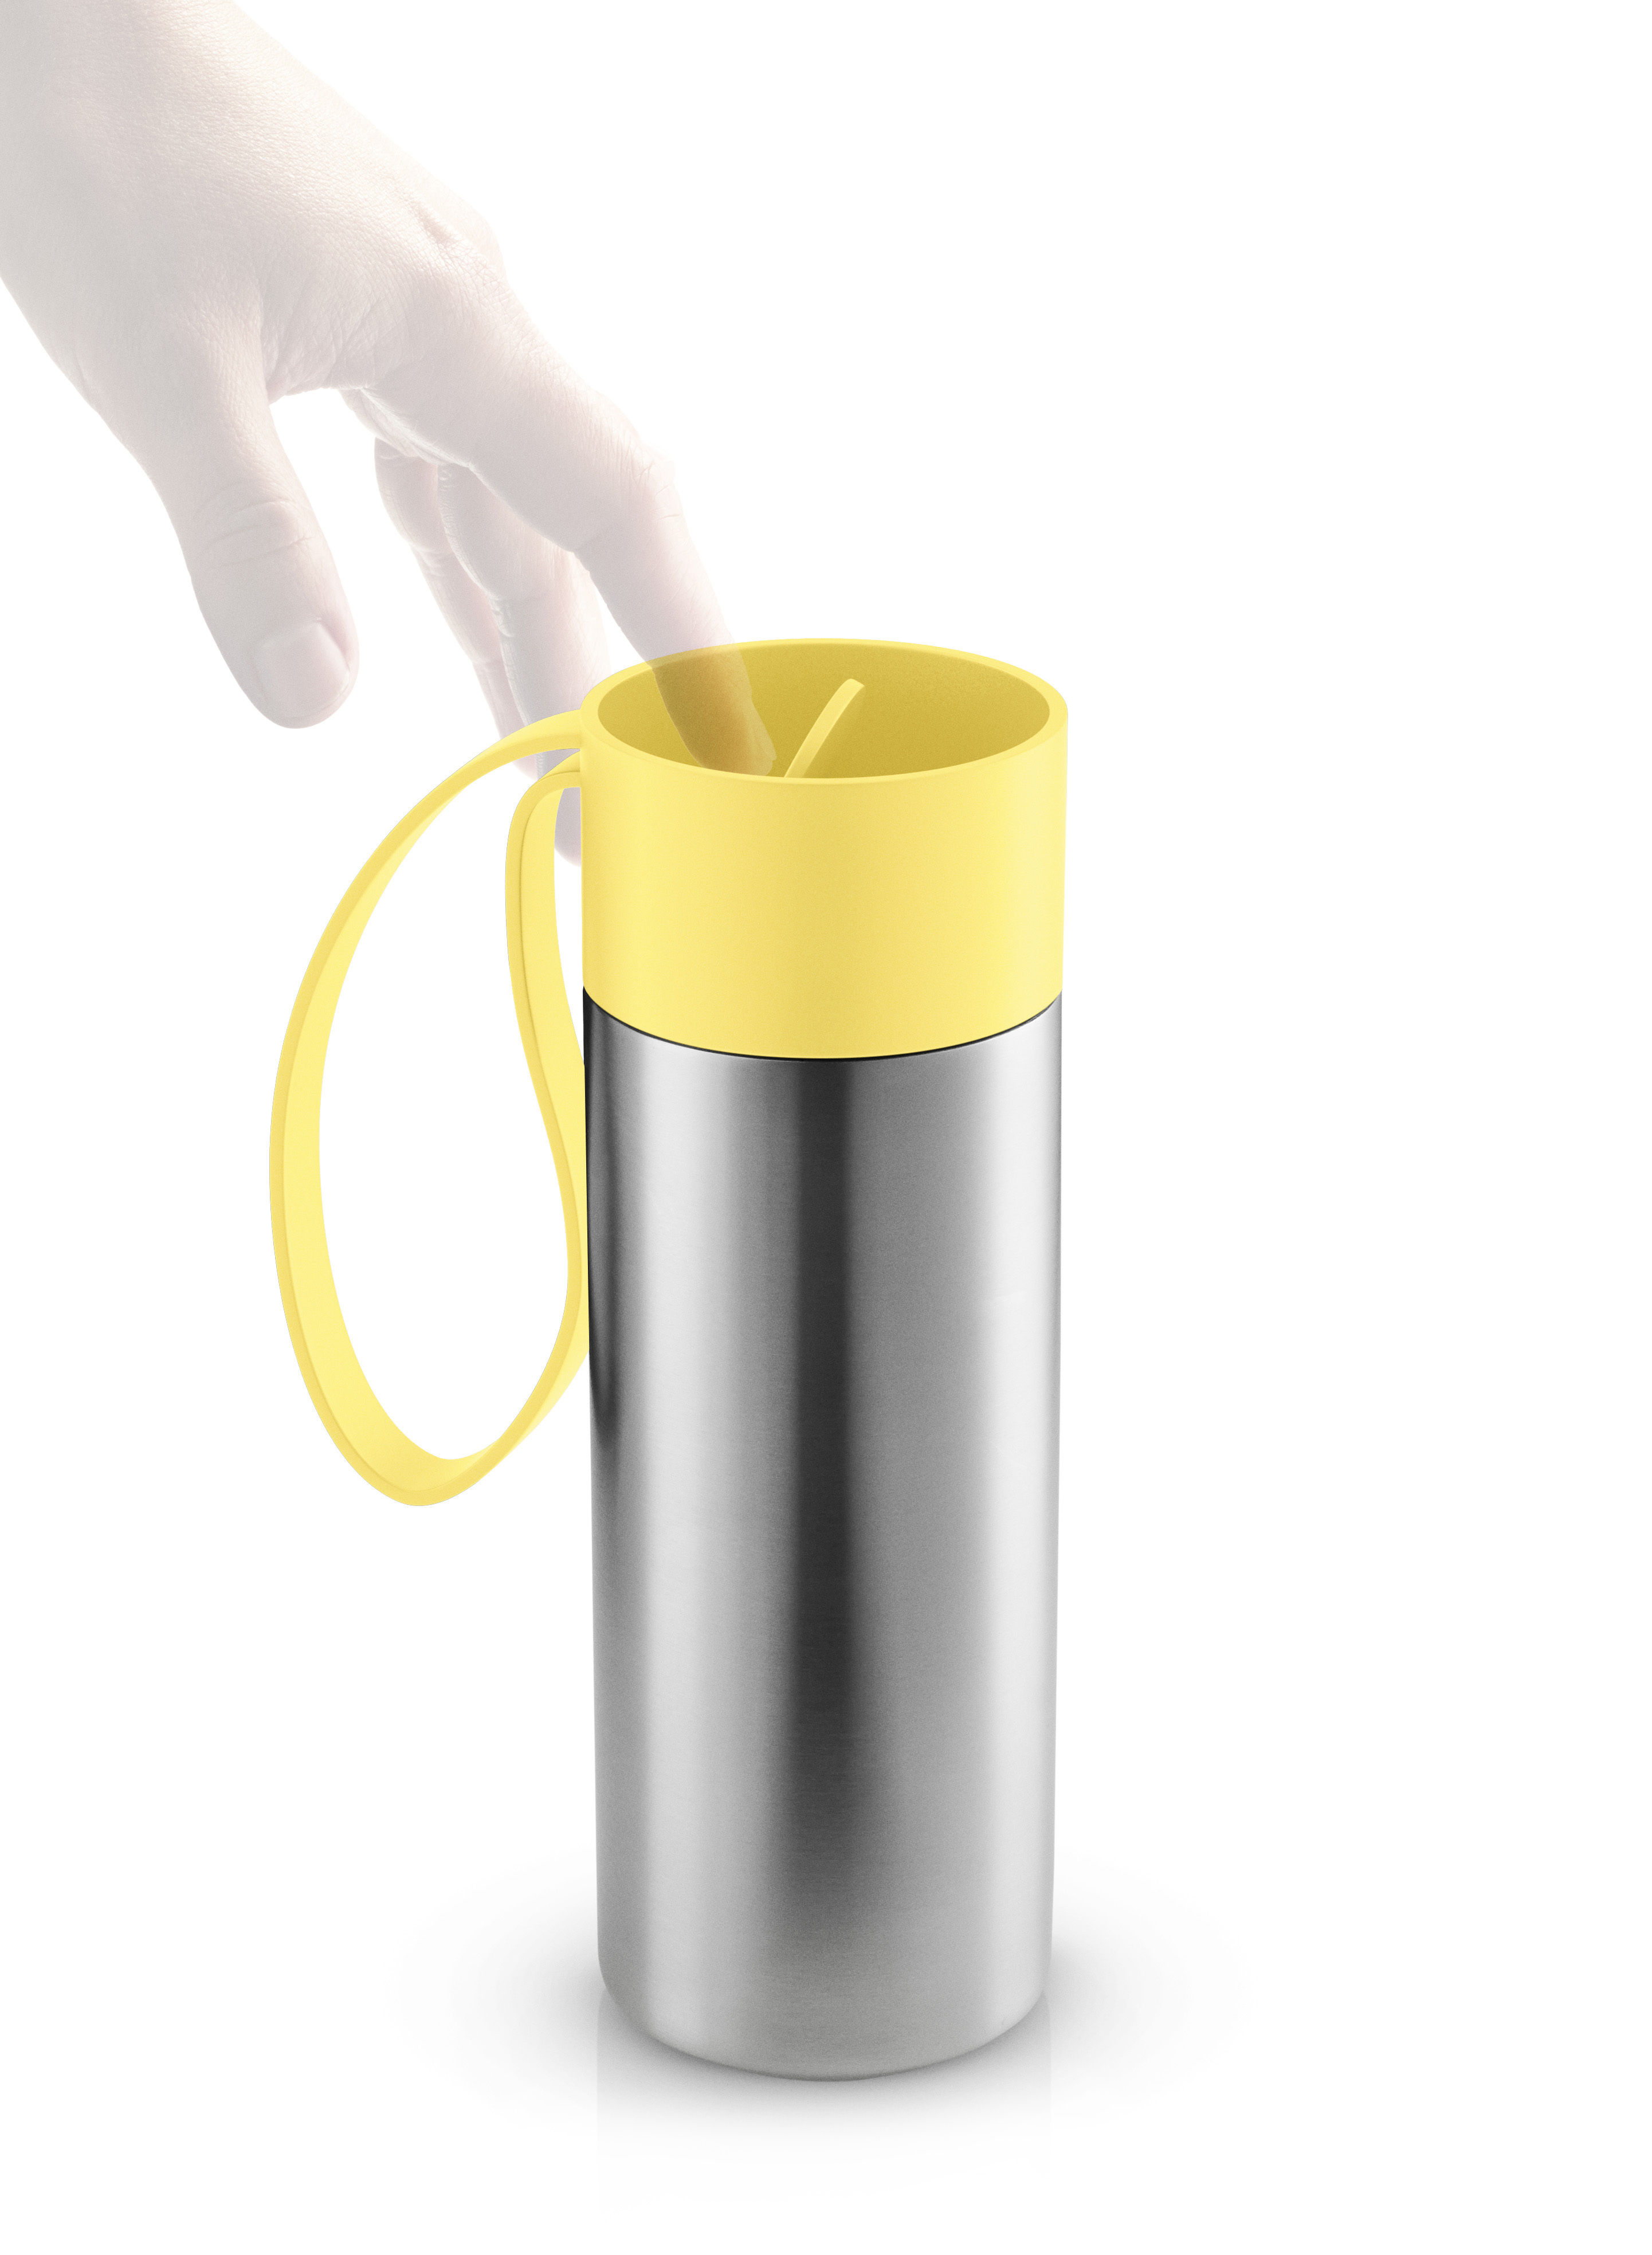 mug isotherme to go cup avec couvercle 0 35 l acier bross jaune limonade eva solo. Black Bedroom Furniture Sets. Home Design Ideas